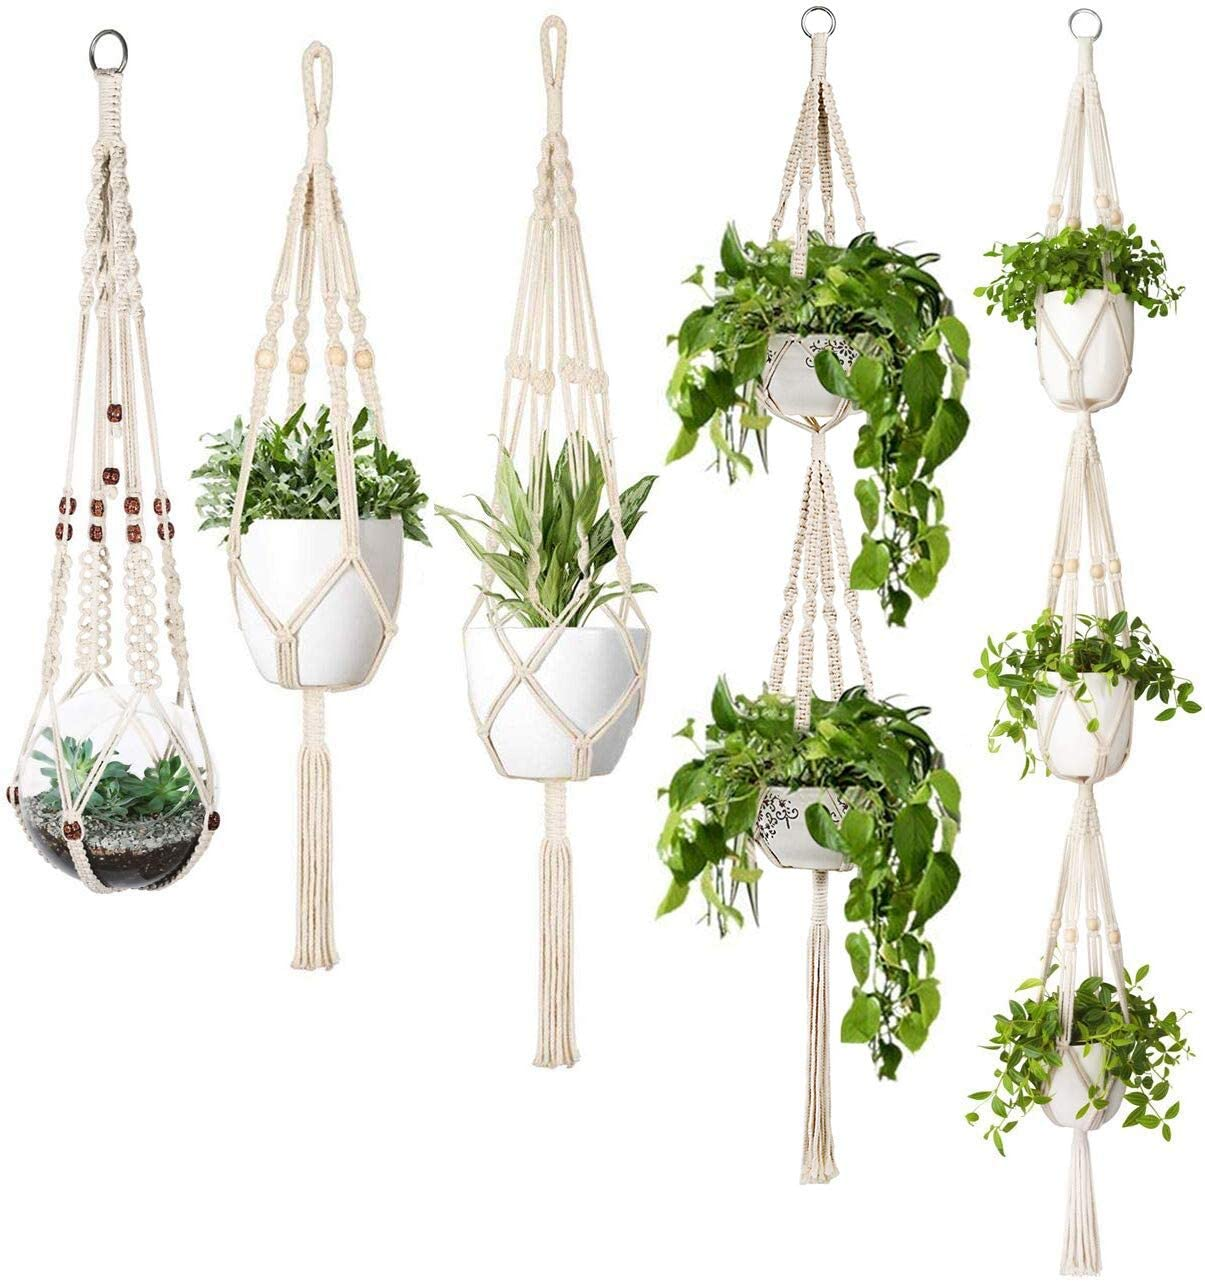 Golden Home Macrame Plant Hanger Set Of 5 Indoor Wall Hanging Planter Basket Flower Pot Holder Boho Home Decor Gift Box Walmart Com Walmart Com